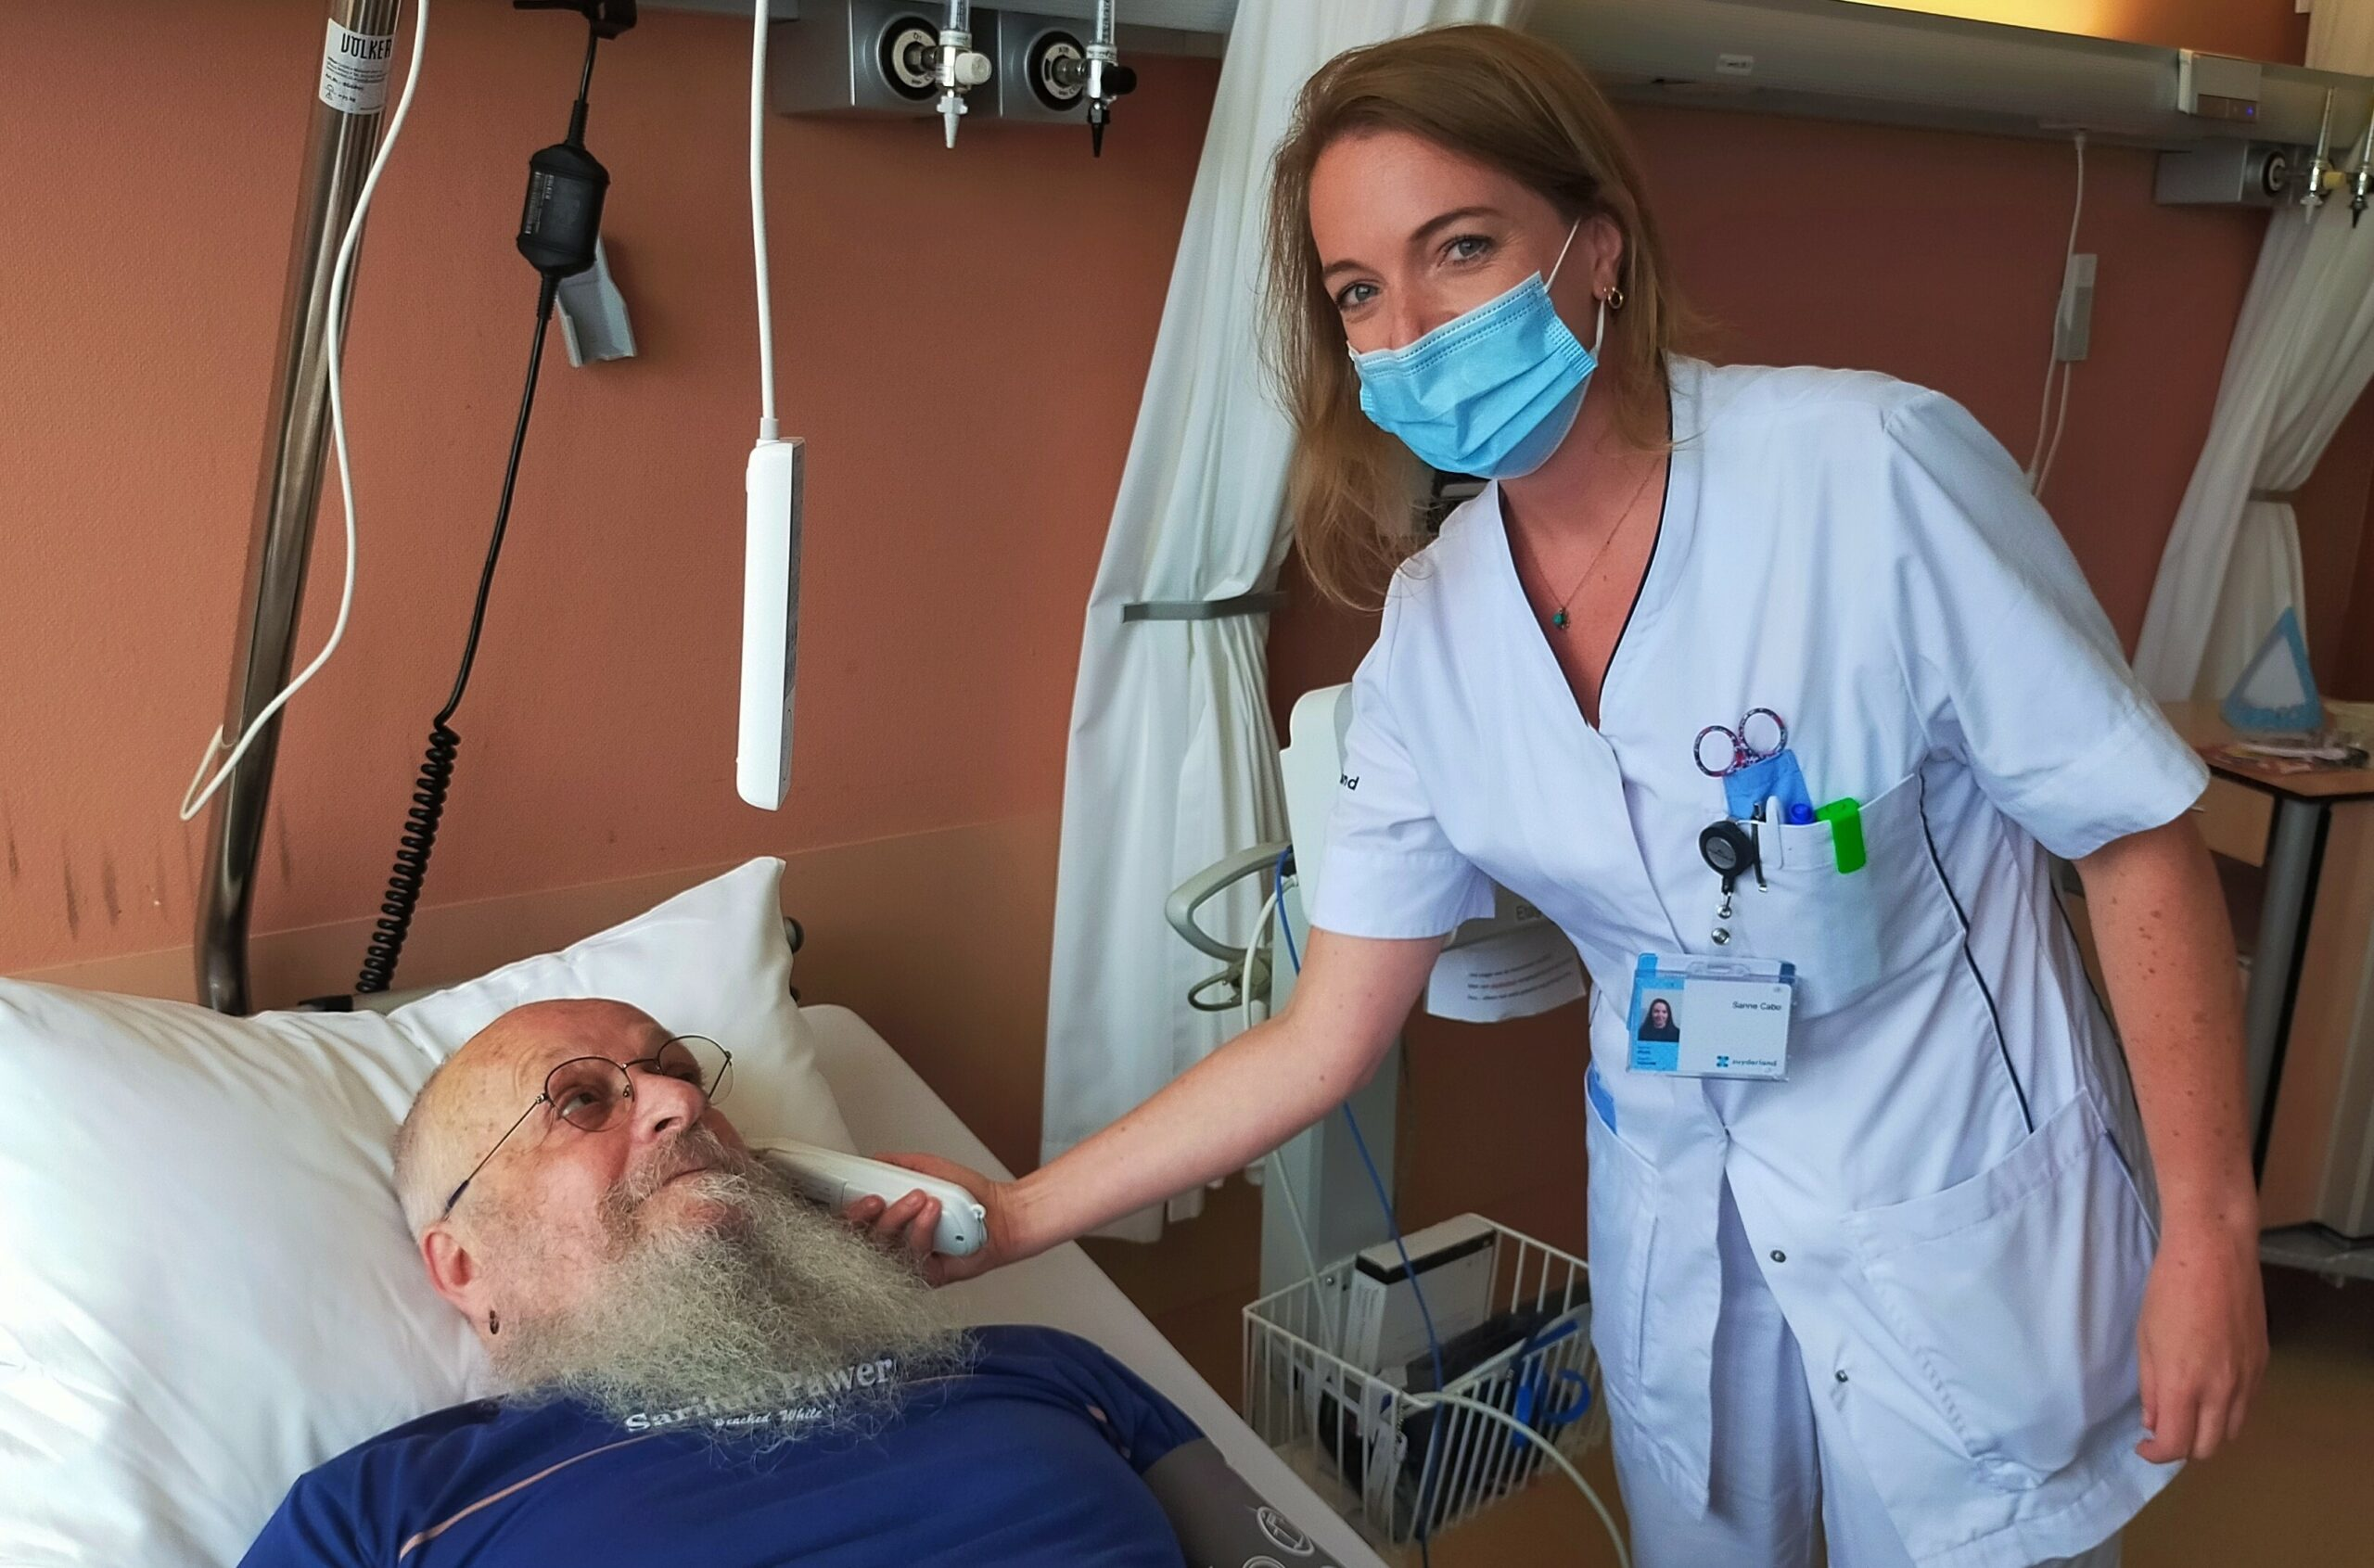 Sanne Cabo verpleegkundige